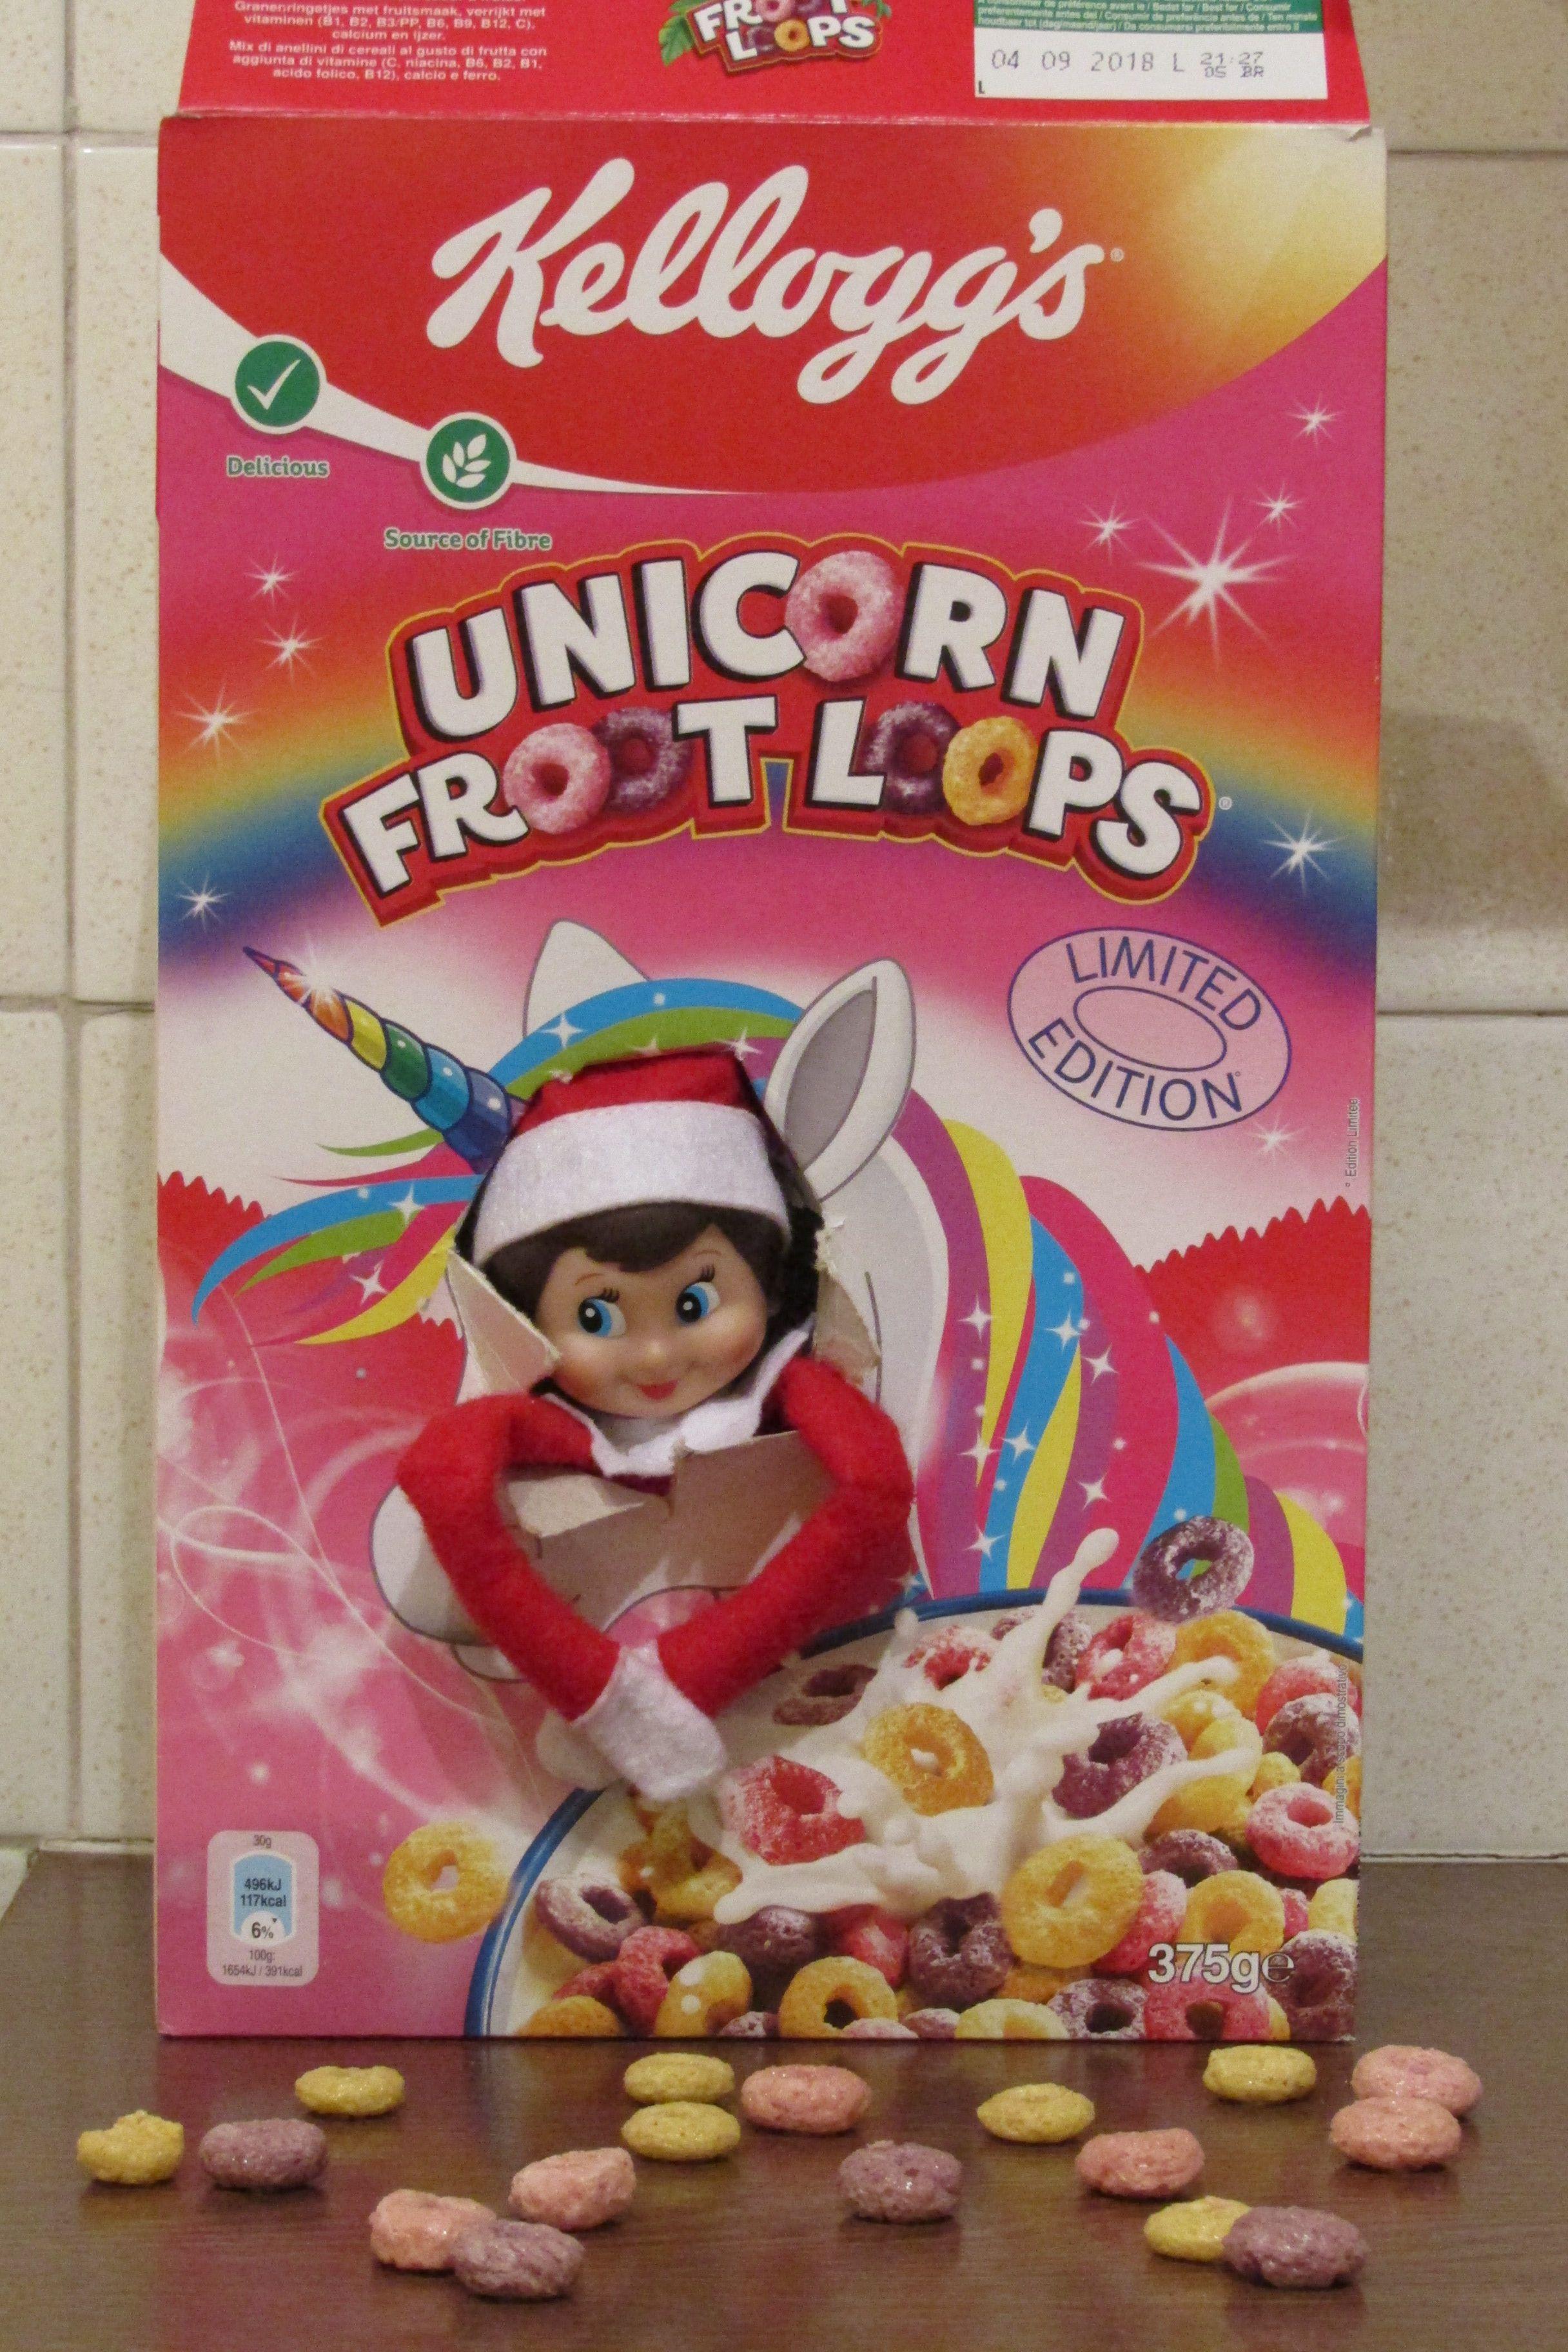 8197949caf59ff35f53ff2cc822faf85 - How To Get Elf On The Shelf Out Of Box